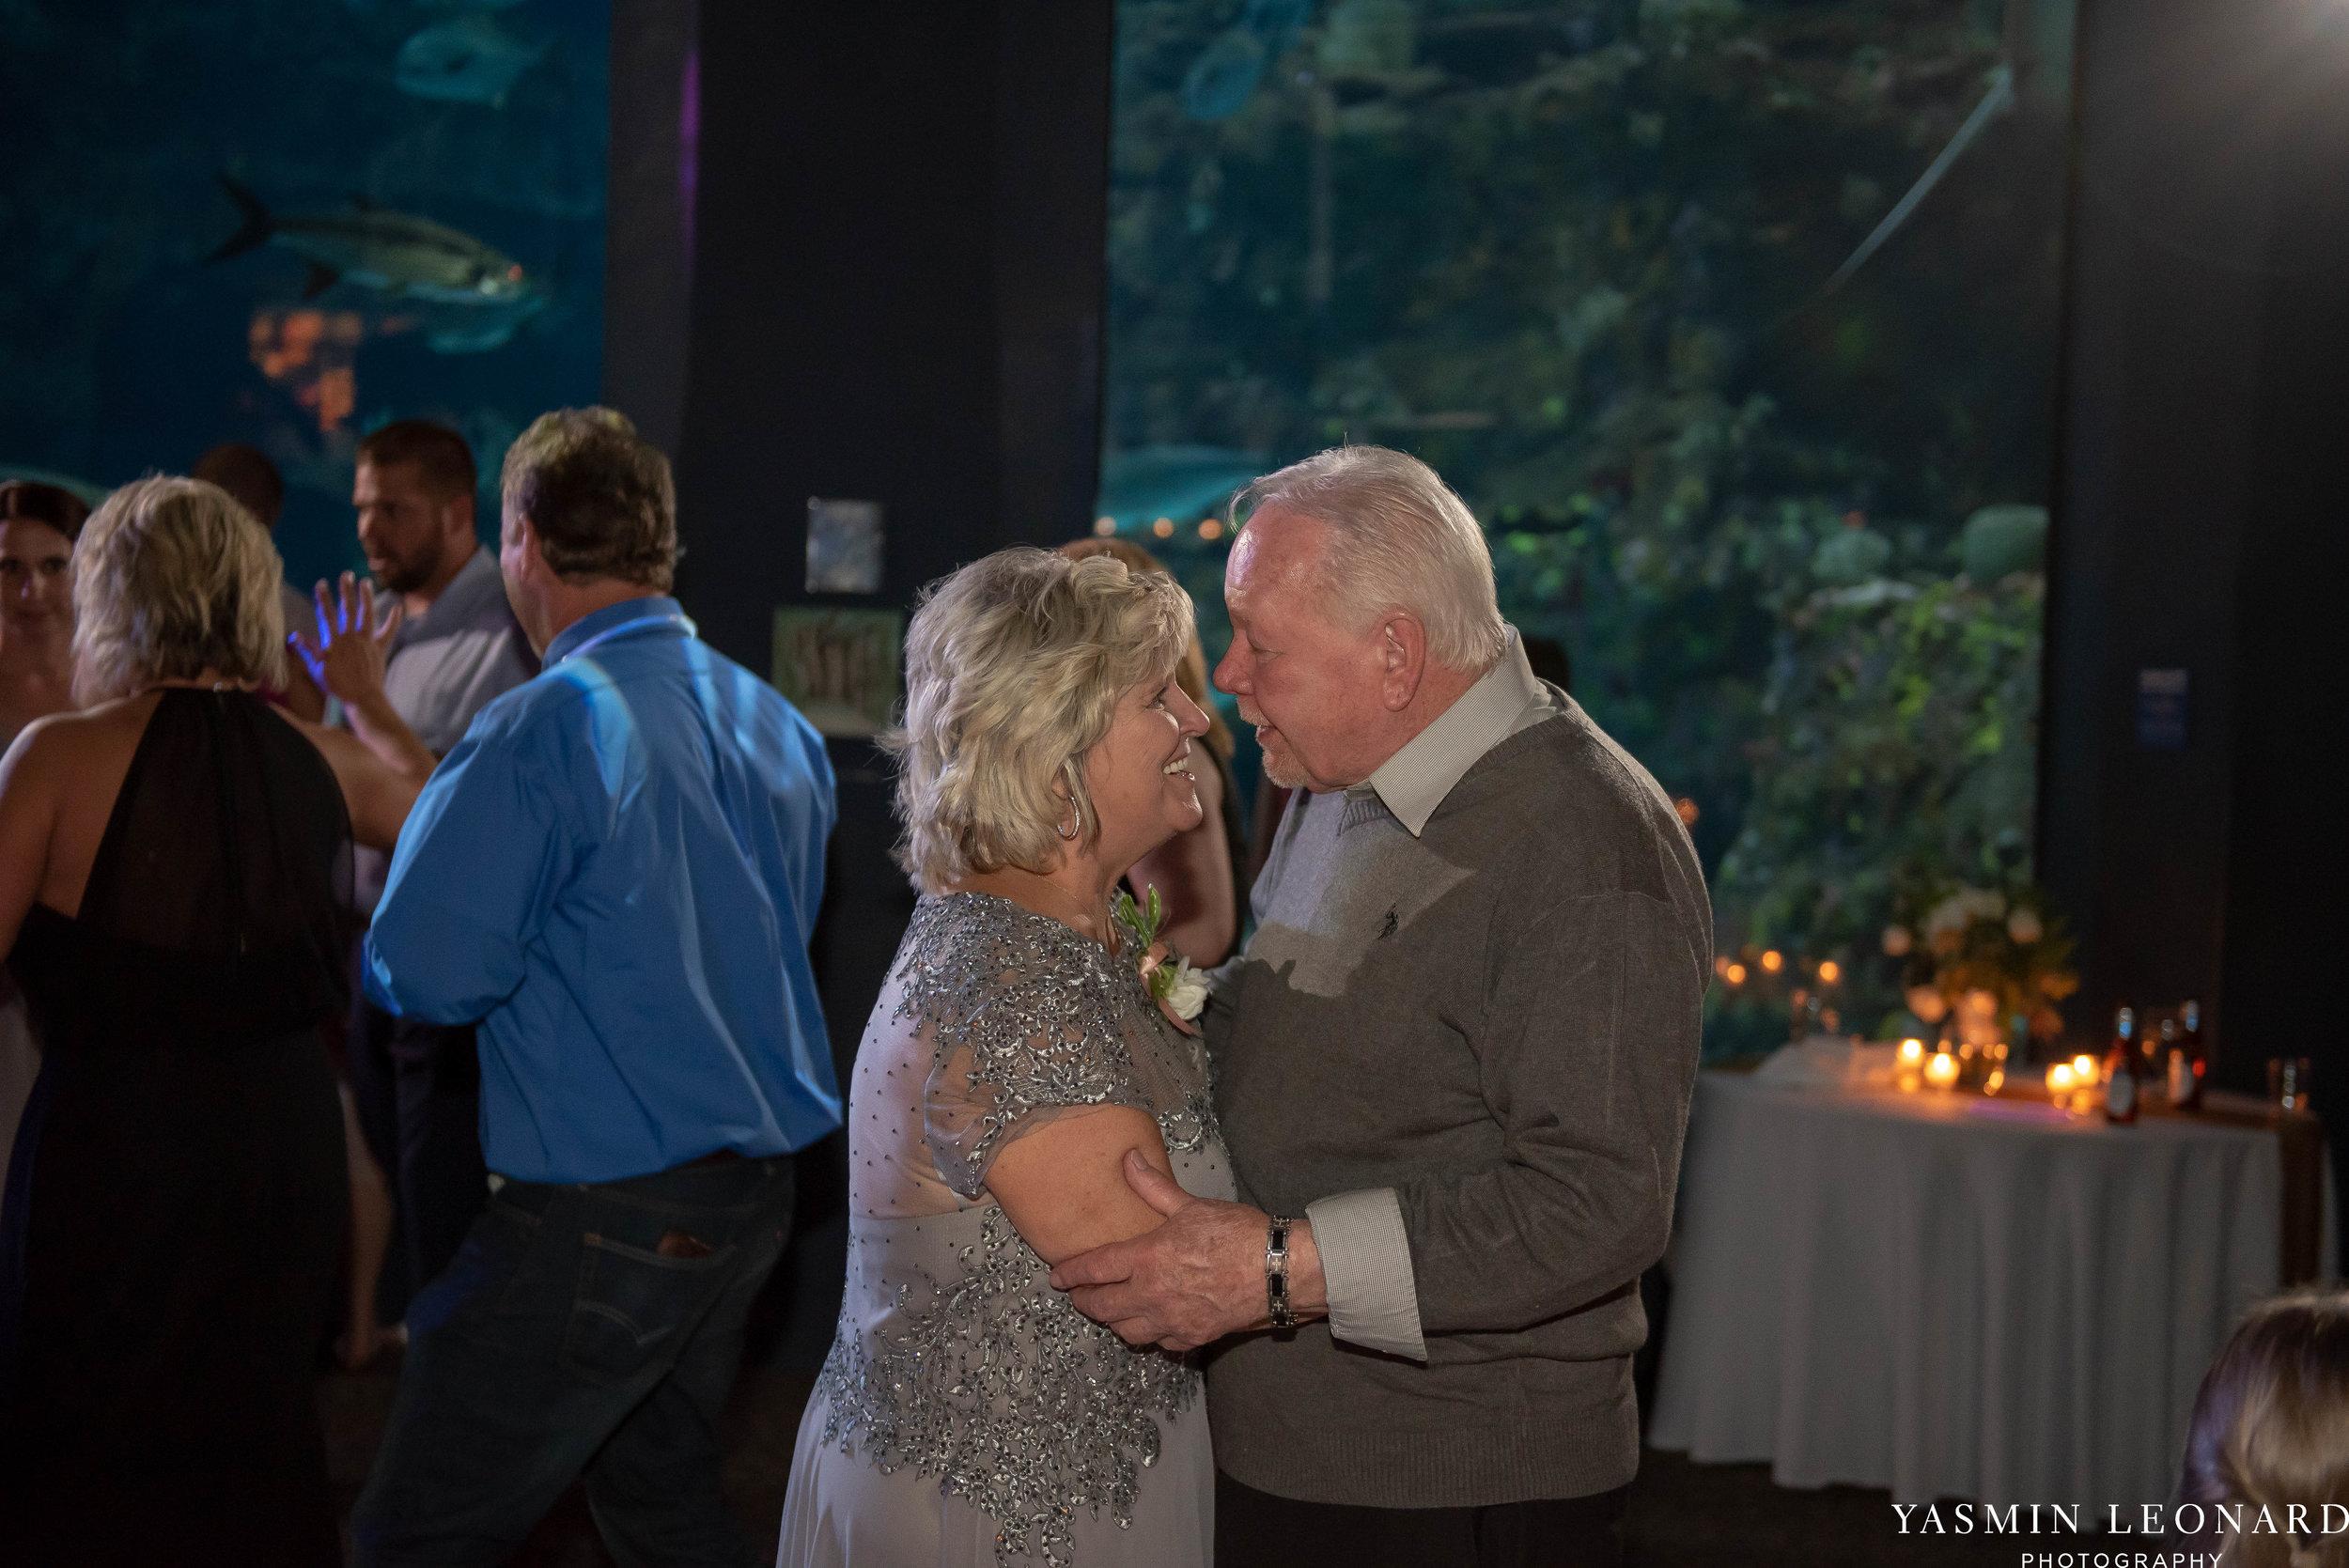 Carolina Beach Wedding - Fort Fisher Wedding - NC Acquarium - Beach Wedding - NC Wedding - Beach Wedding Inspiration - Beach Bride-61.jpg